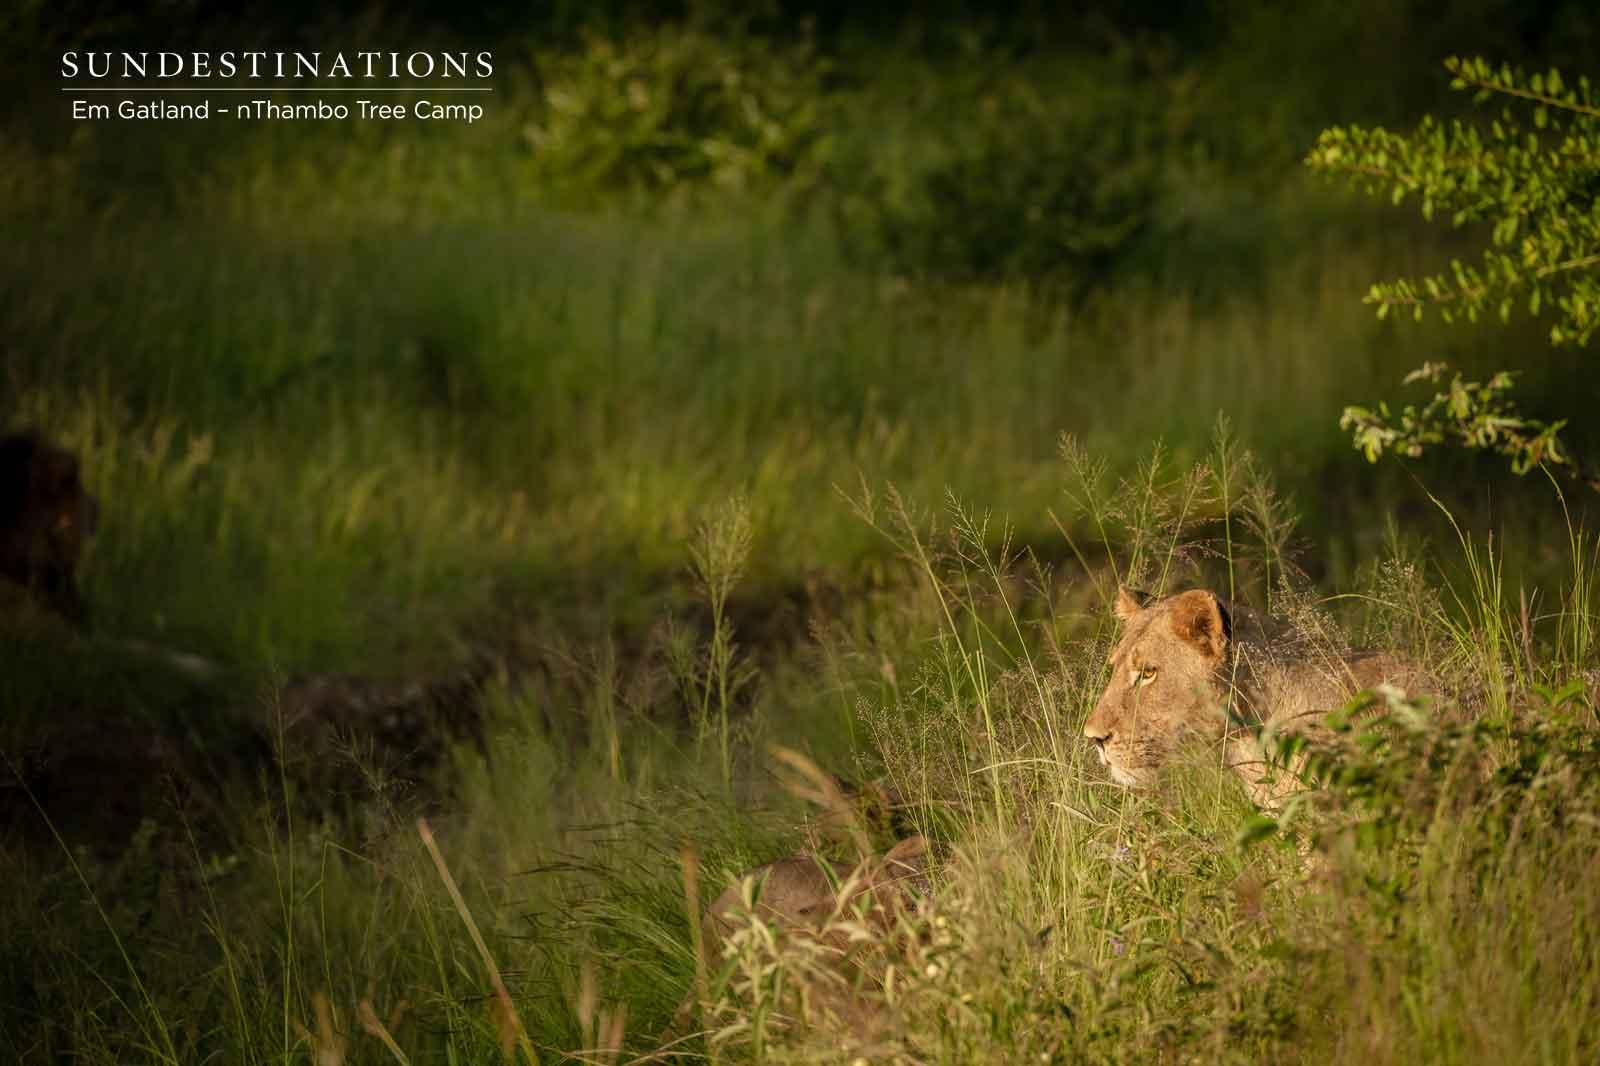 Lioness in Klaserie